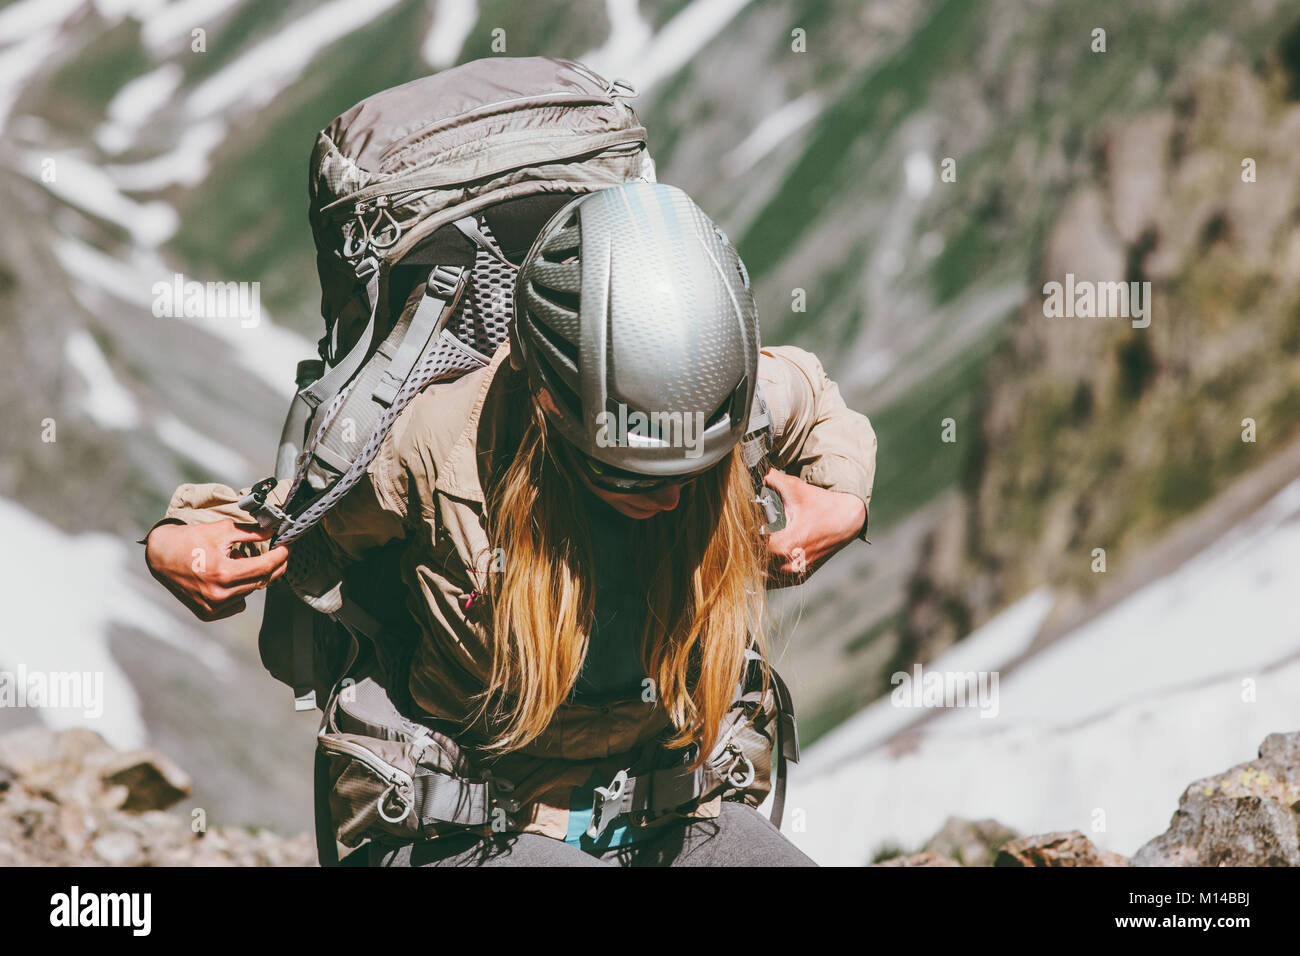 Frau mit Rucksack wandern in den Bergen reisen, gesunden Lebensstil Abenteuer Konzept Aktiv Sommer Ferien im freien Stockbild